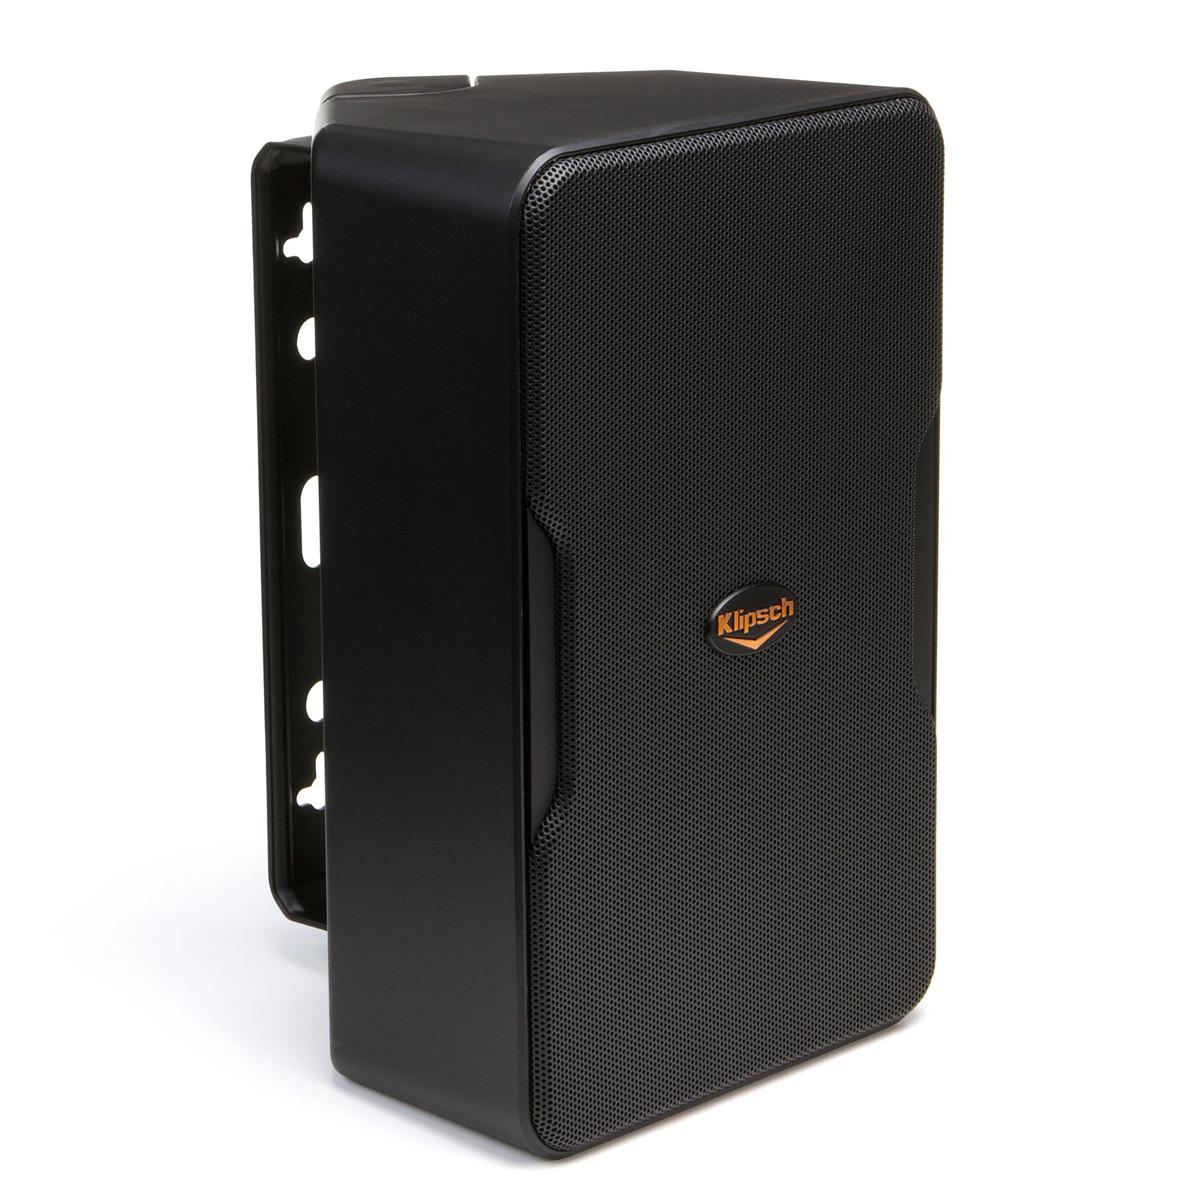 Klipsch-CP-6-Compact-Performance-Series-Outdoor-Loudspeakers-Pair thumbnail 3